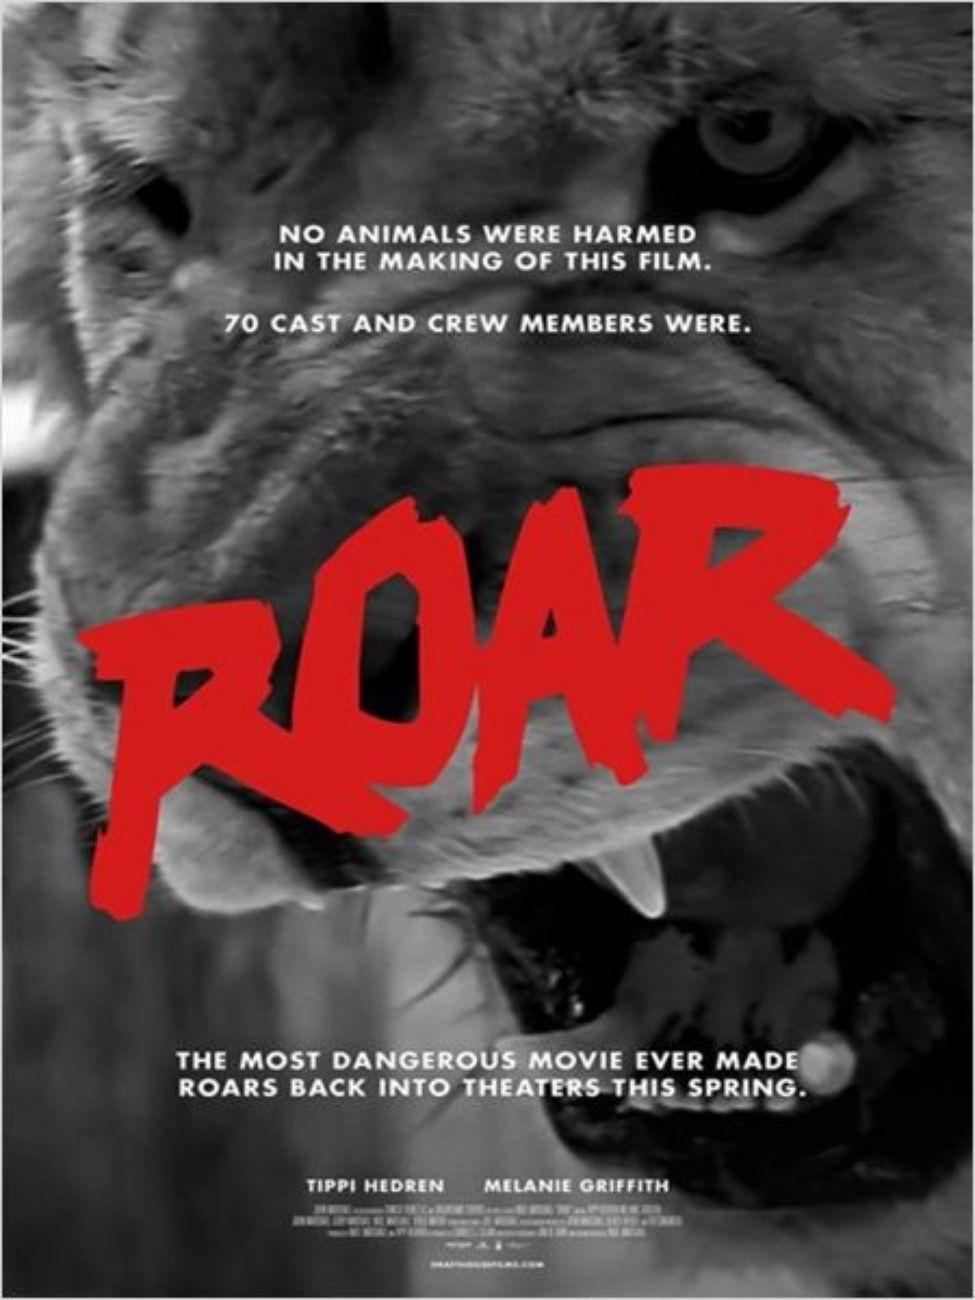 roar film cinema sorties cine artistik rezo paris